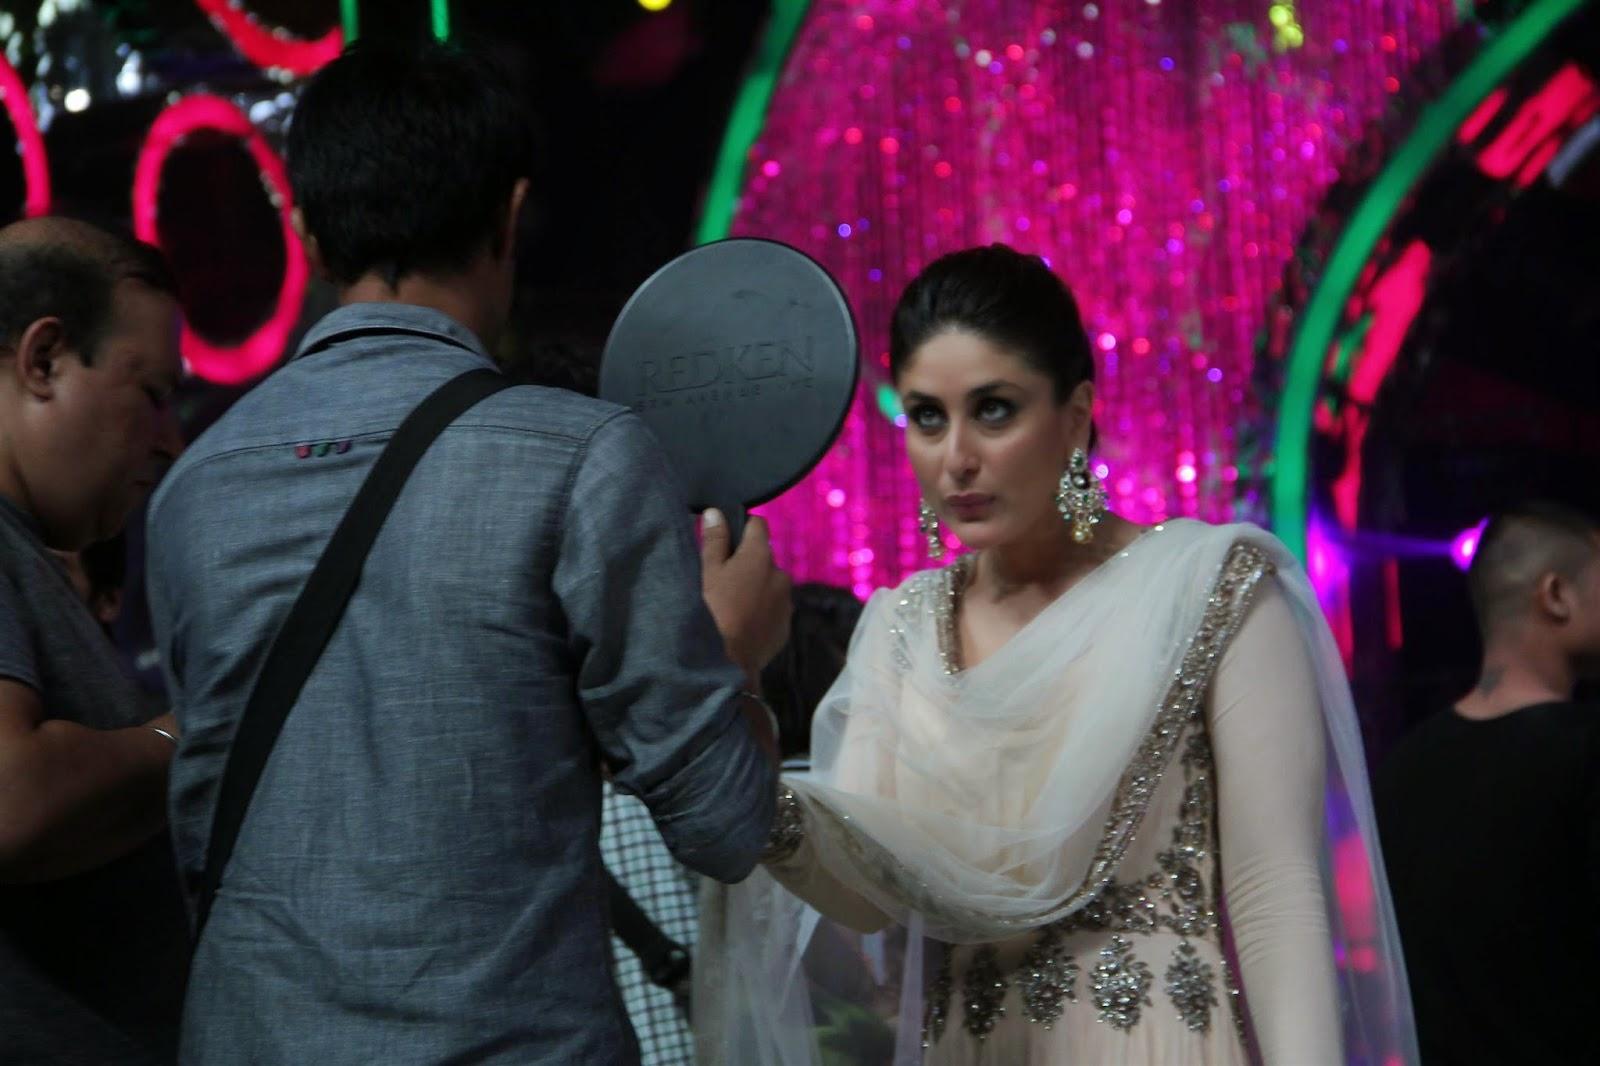 http://1.bp.blogspot.com/-wosDIGVxCuk/U9jSFkCuIqI/AAAAAAABwBs/ThgII-nkzUk/s1600/Bollywood+Actress+Kareena+Kapoor+Promotes+her+upcoming+movie+%27Singham+Returns%27+On+Jhalak+Dikhhla+Jaa+7+gallery.+(12).JPG